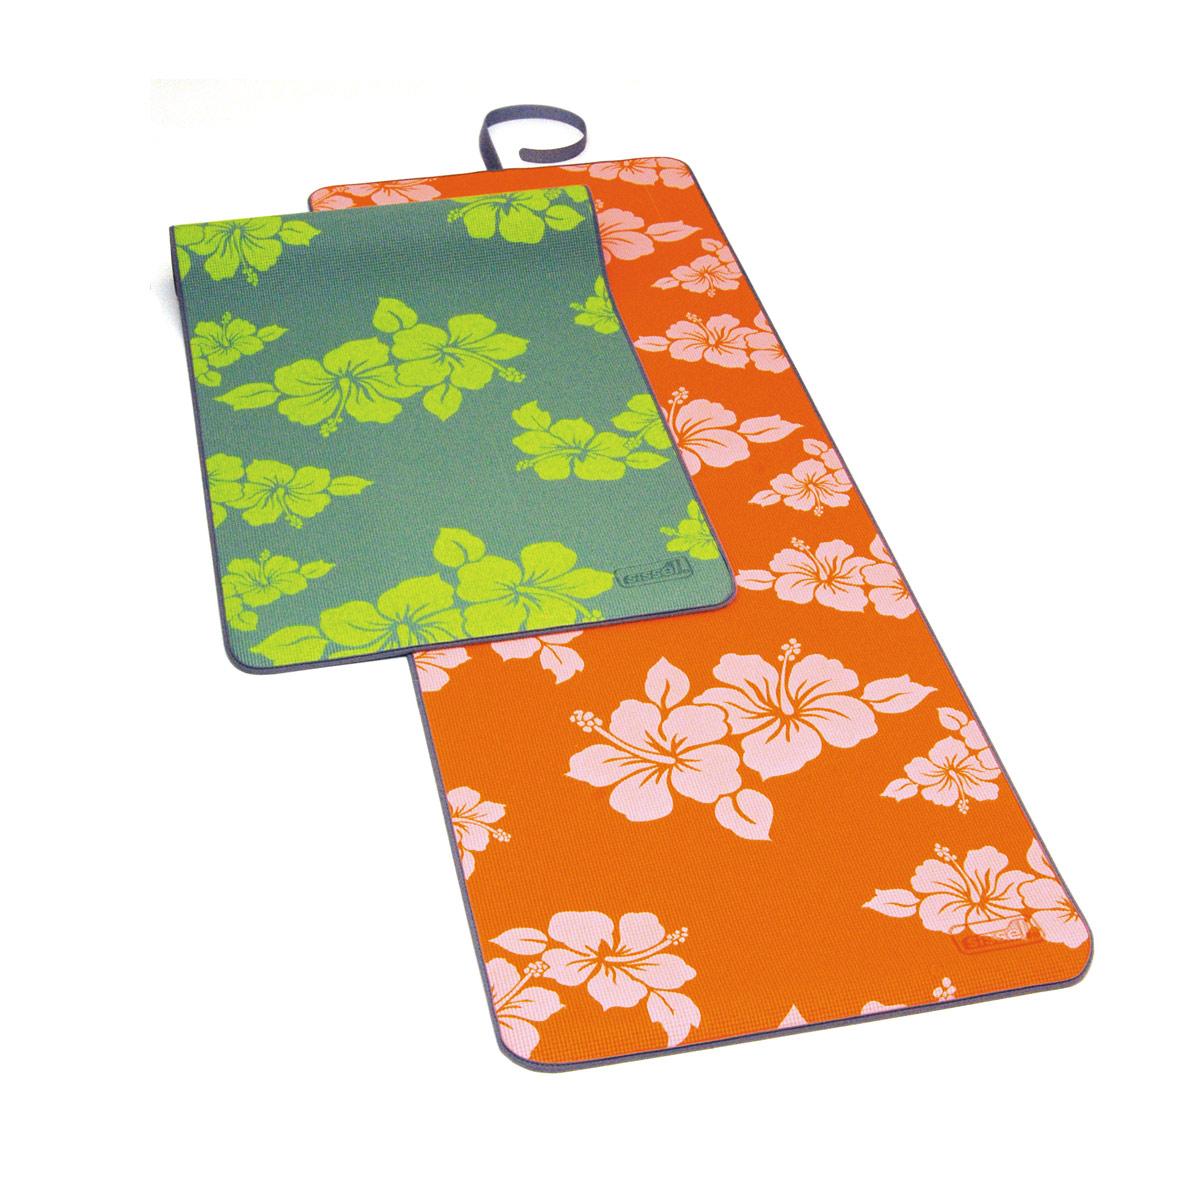 Tappetino Colorato E Floreale Yoga Flower Sissel